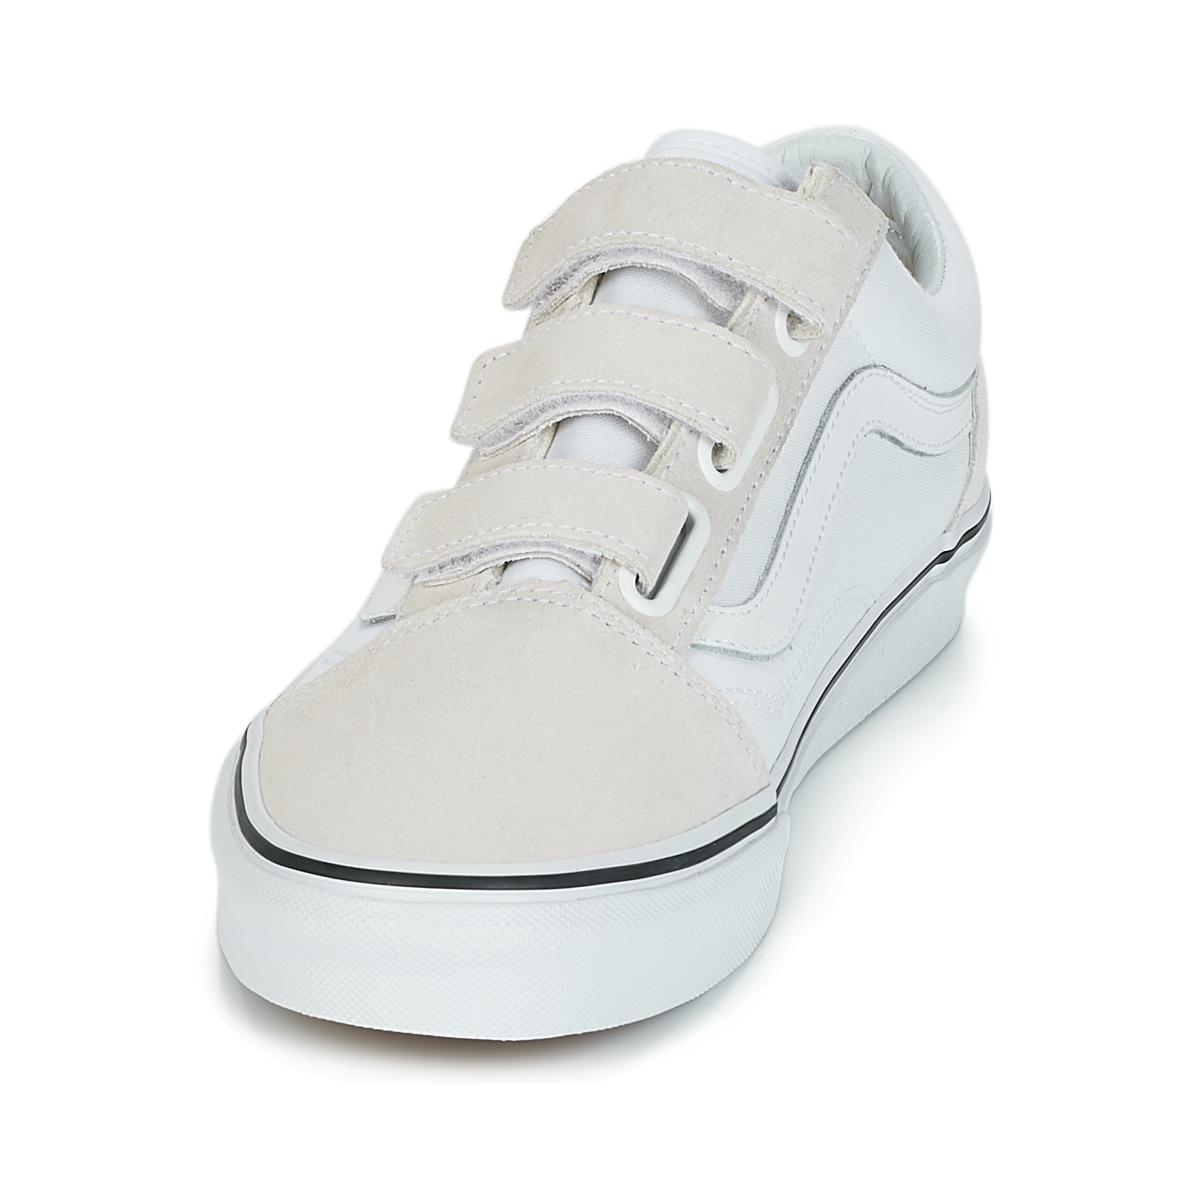 Vans Old Skool V Shoes (trainers) in Beige (Natural)